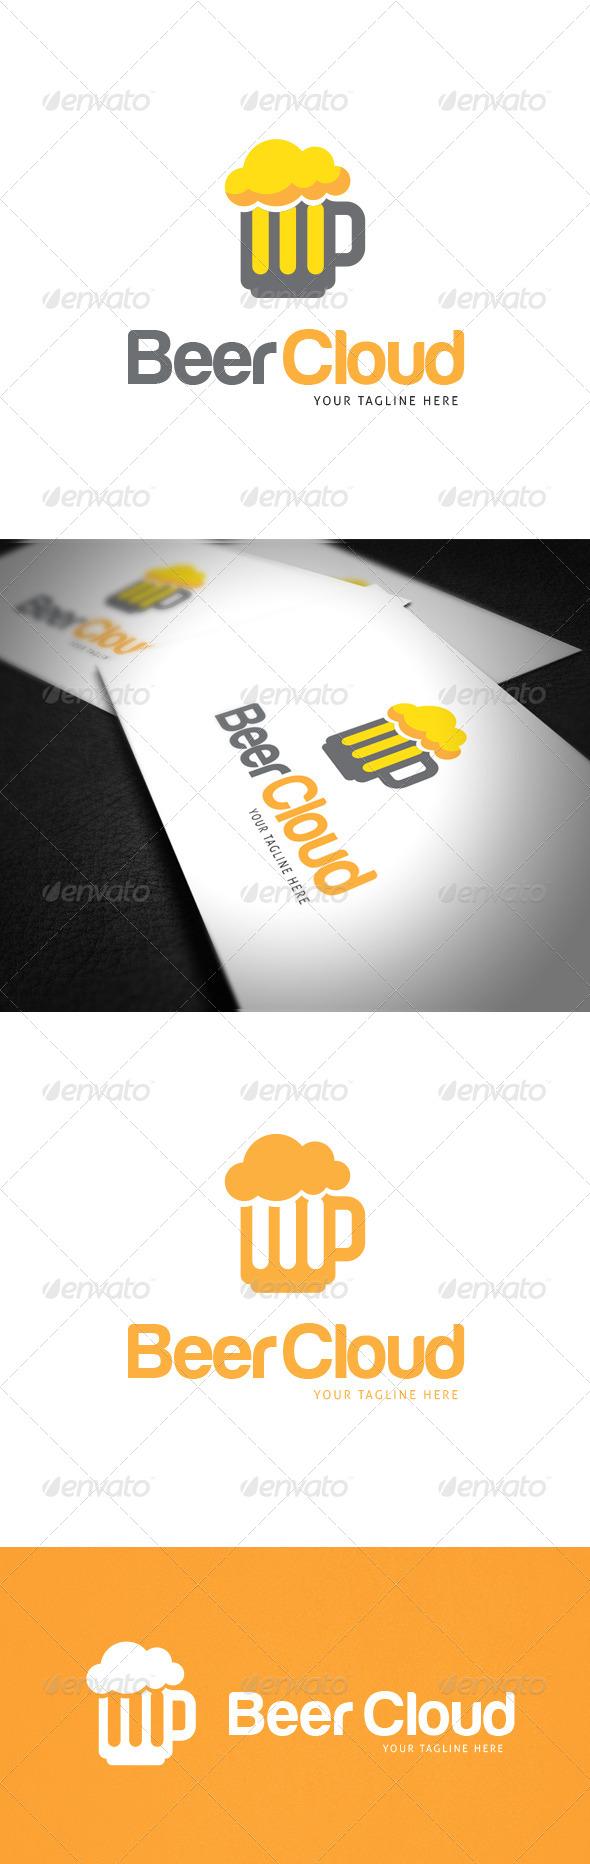 Beer Cloud Logo Template